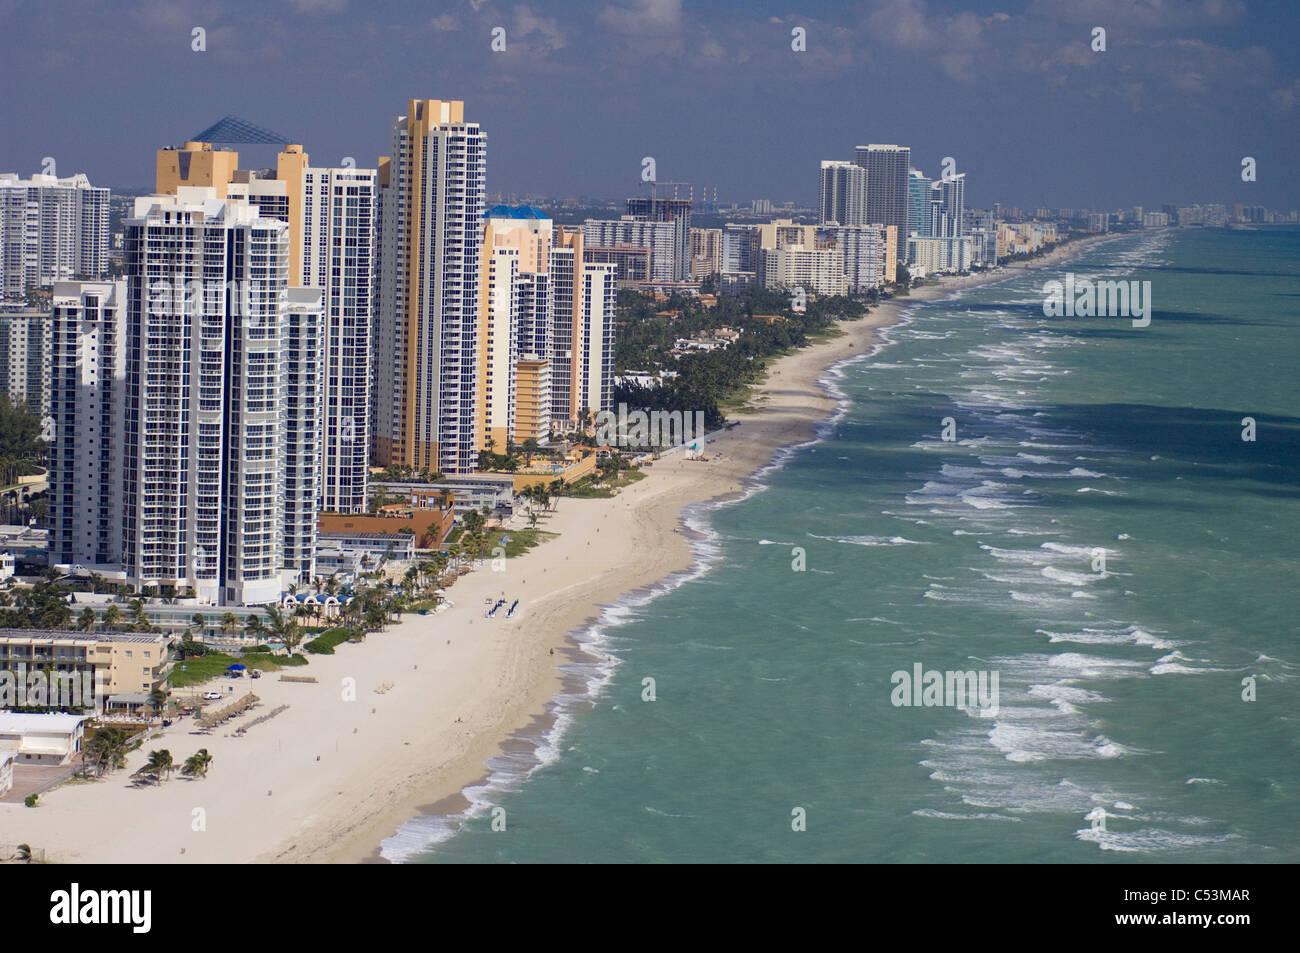 Hallandale North Miami area development on beach coastal development - Stock Image